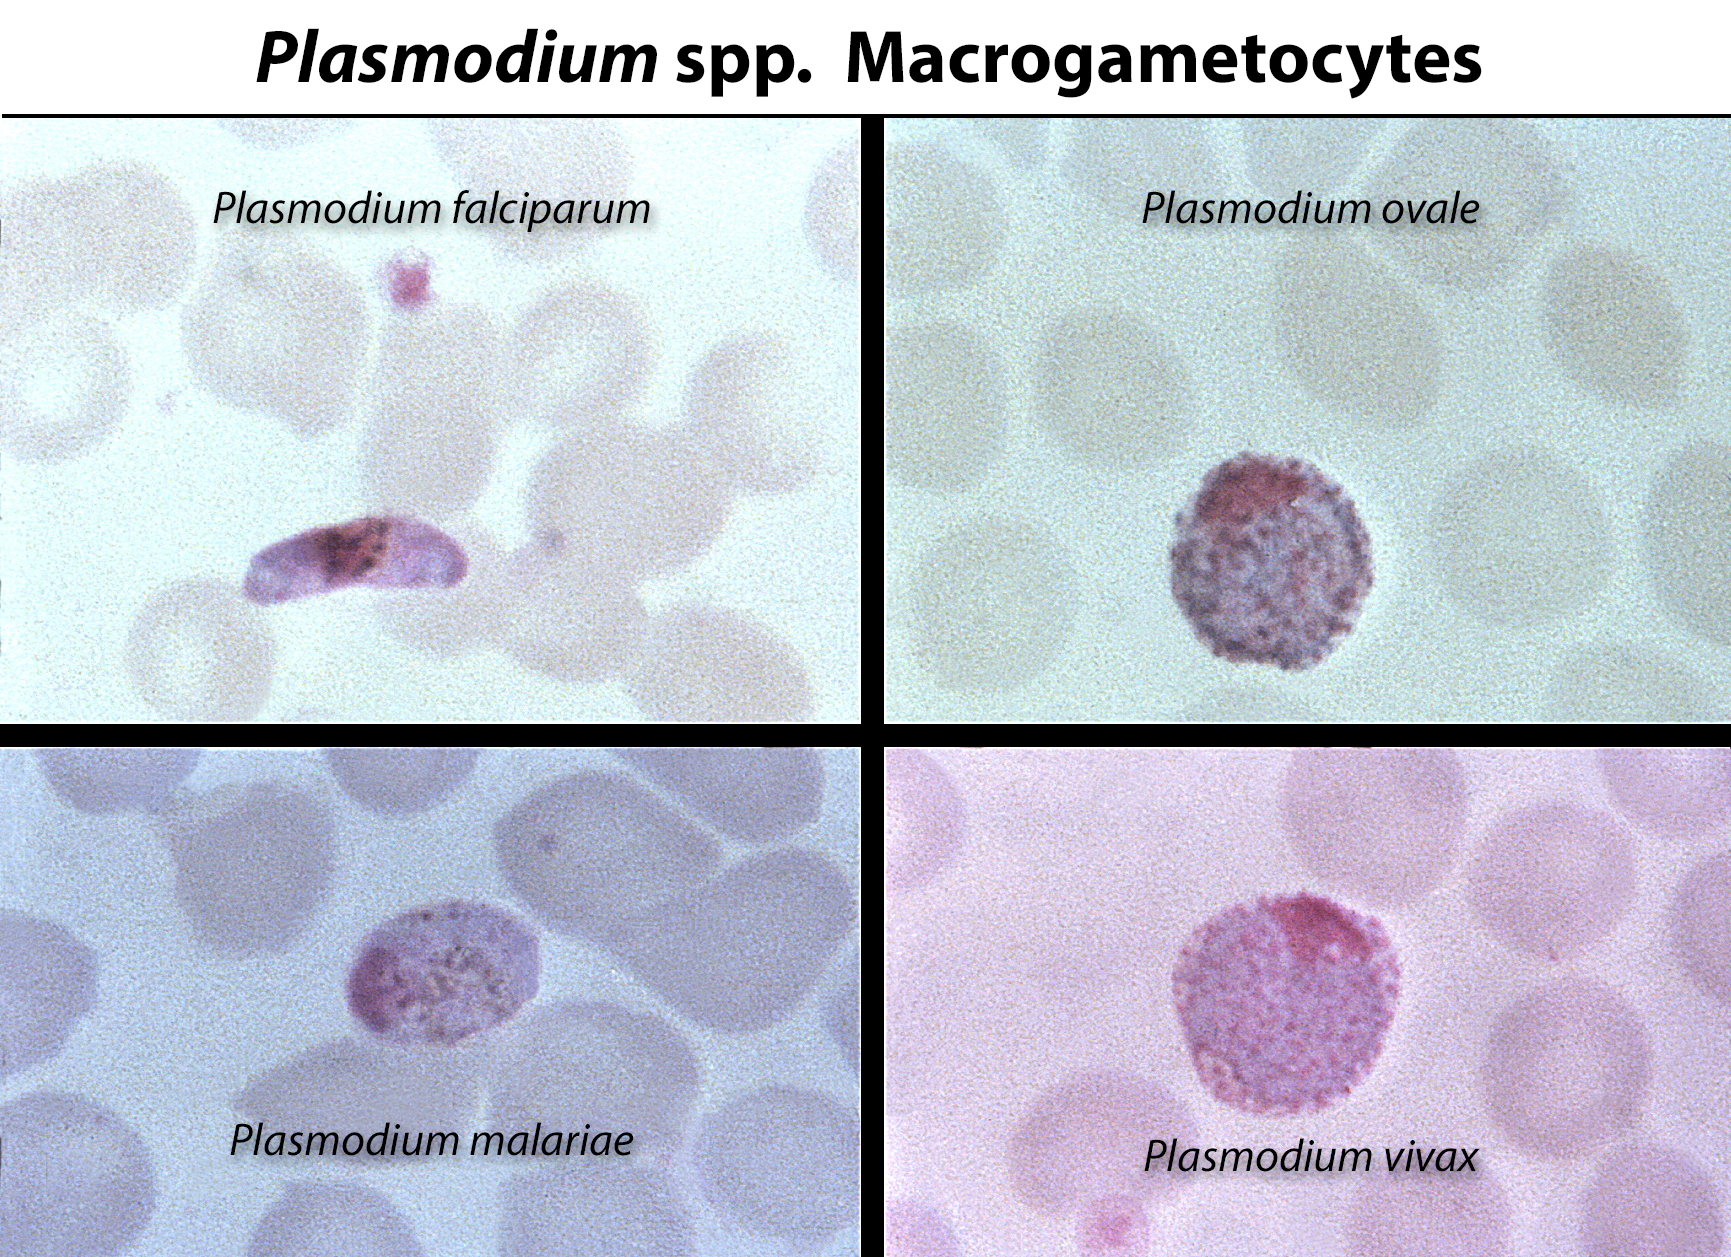 Malaria parasite micrographs